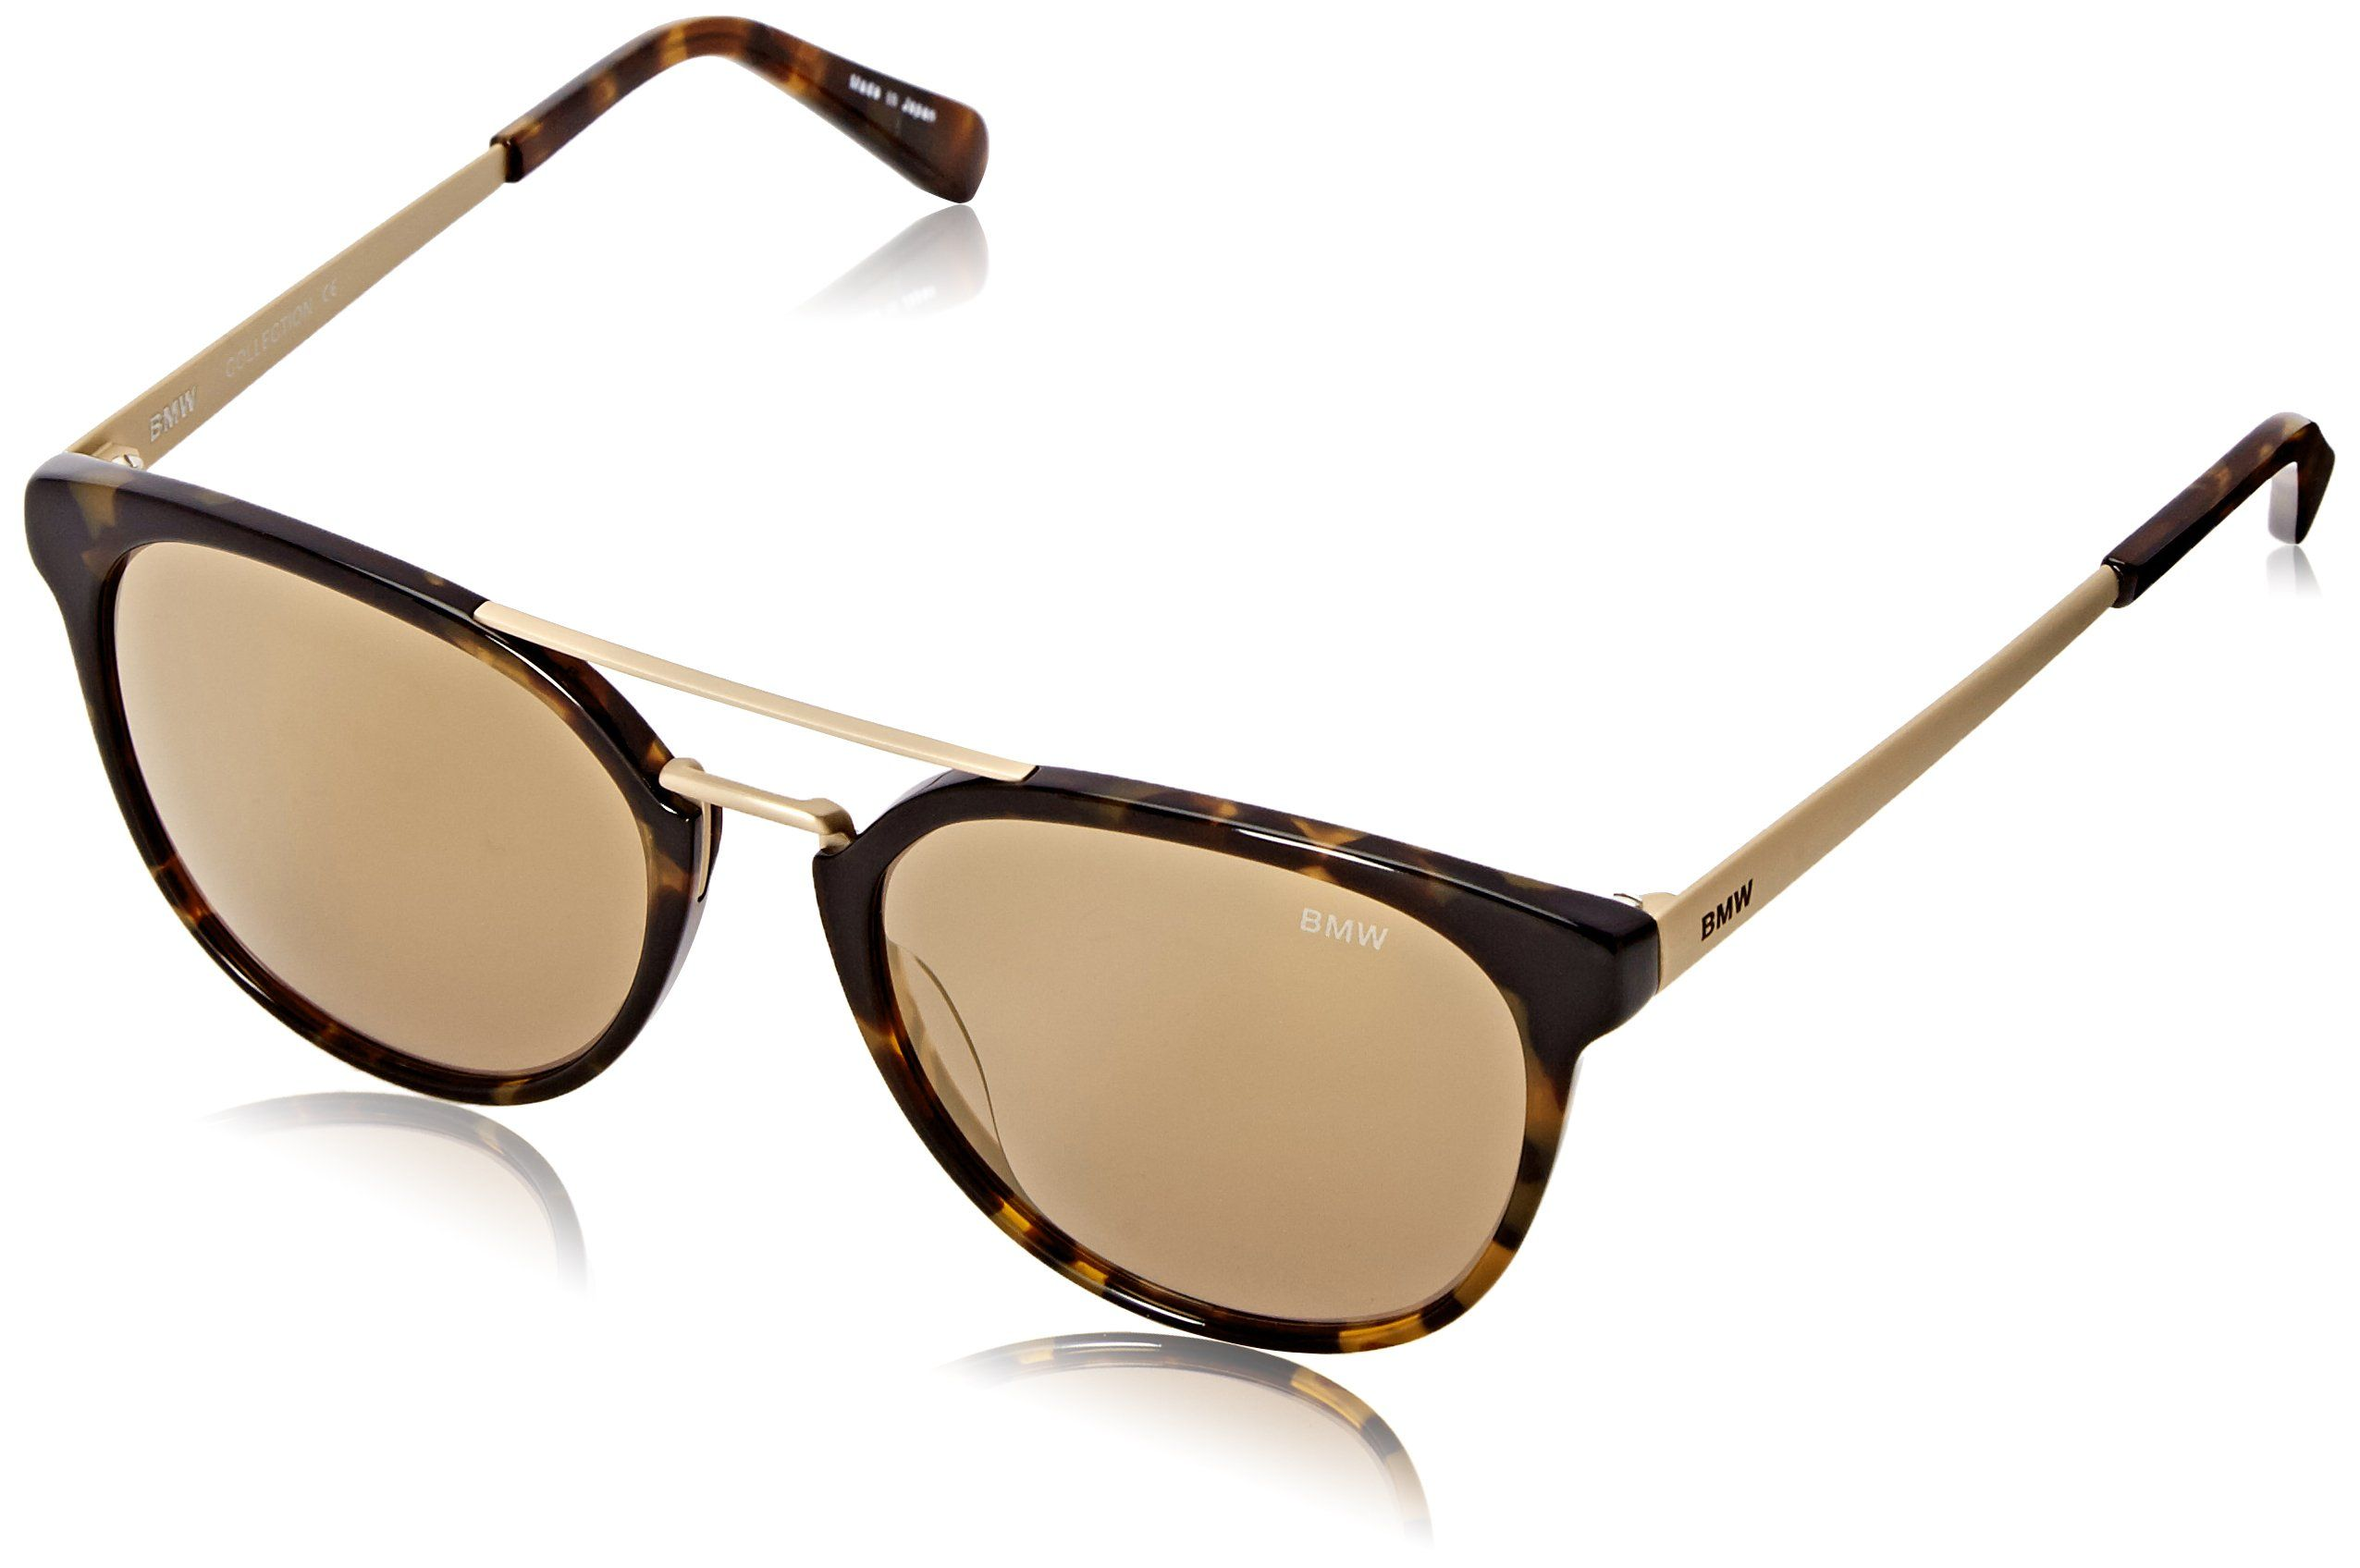 sunglasses p popular economic bmw steel c red driving women ja rayban ray womens sunwear matte genuine foldable ban the s jajo